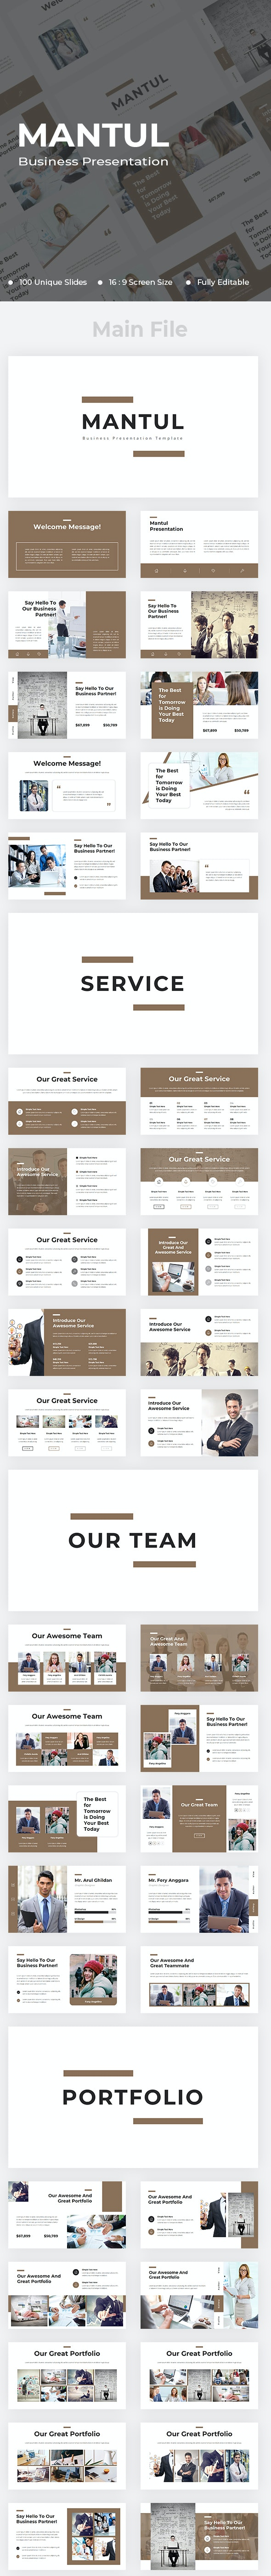 Mantul Business PowerPoint - Business PowerPoint Templates